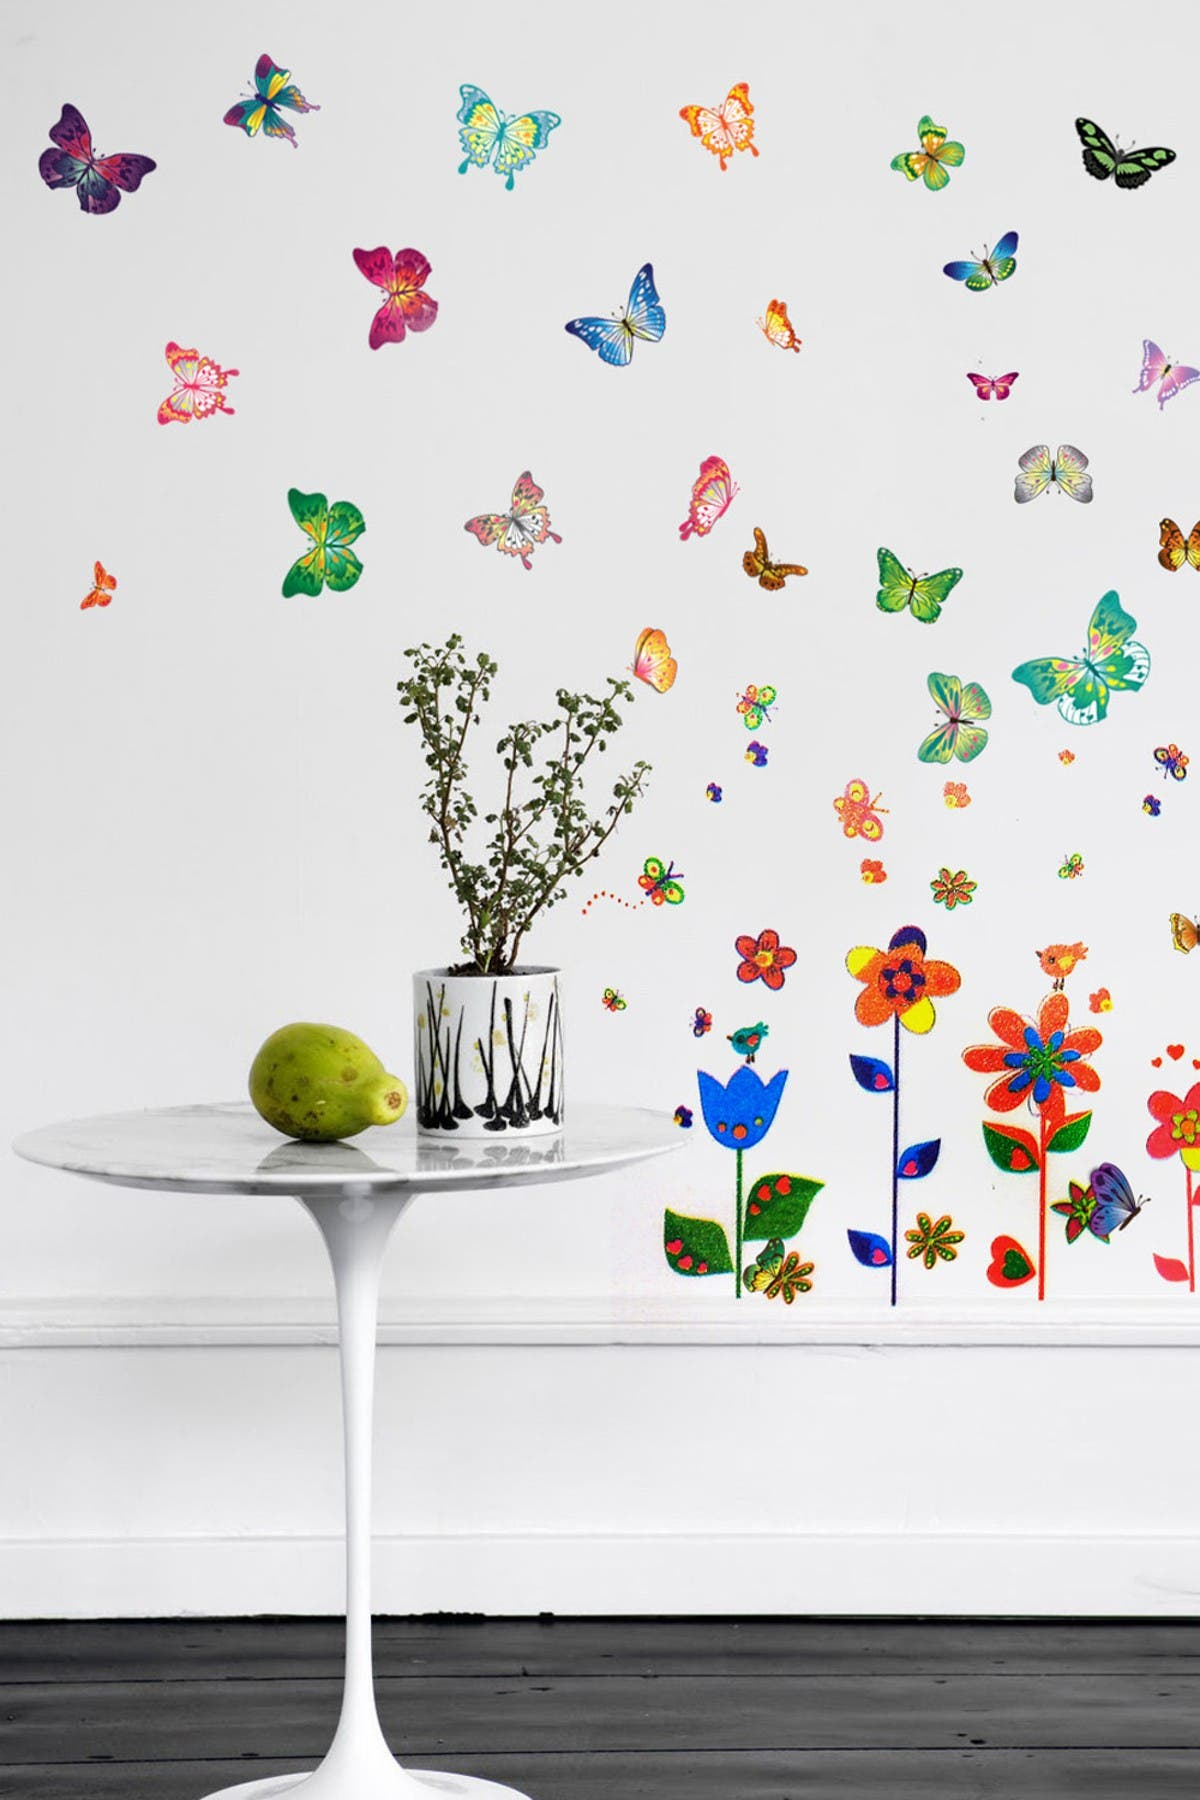 Image of WalPlus Colorful Flowers & Butterflies Decal